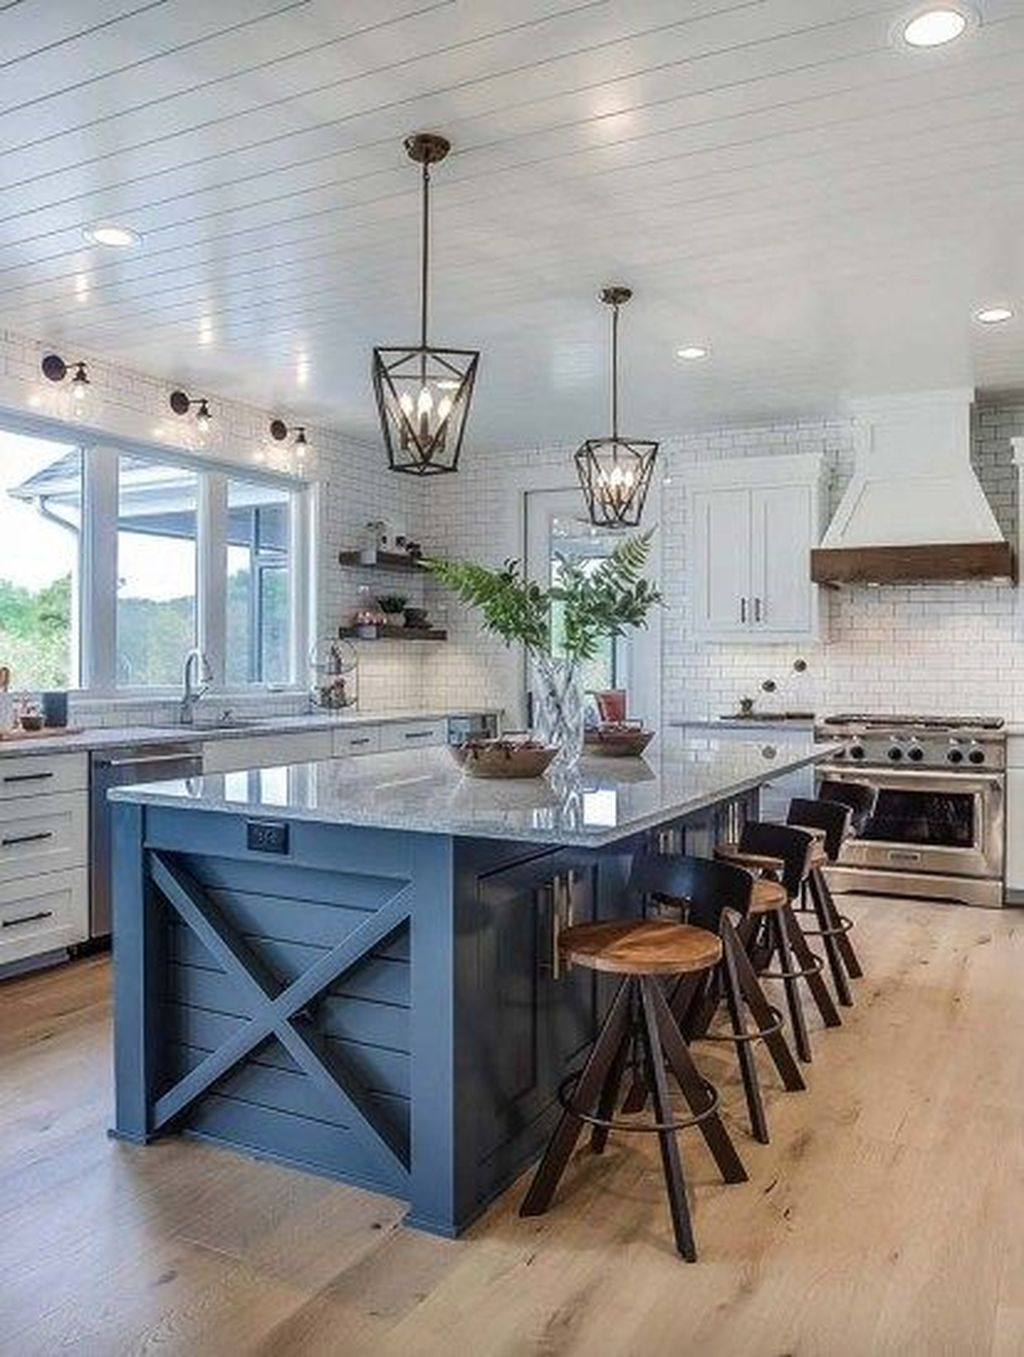 35 Attractive Modern Farmhouse Kitchen Ideas Design Page 21 Of 39 Fathinah Dec Farmhouse Kitchen Design Rustic Farmhouse Kitchen Modern Farmhouse Kitchens